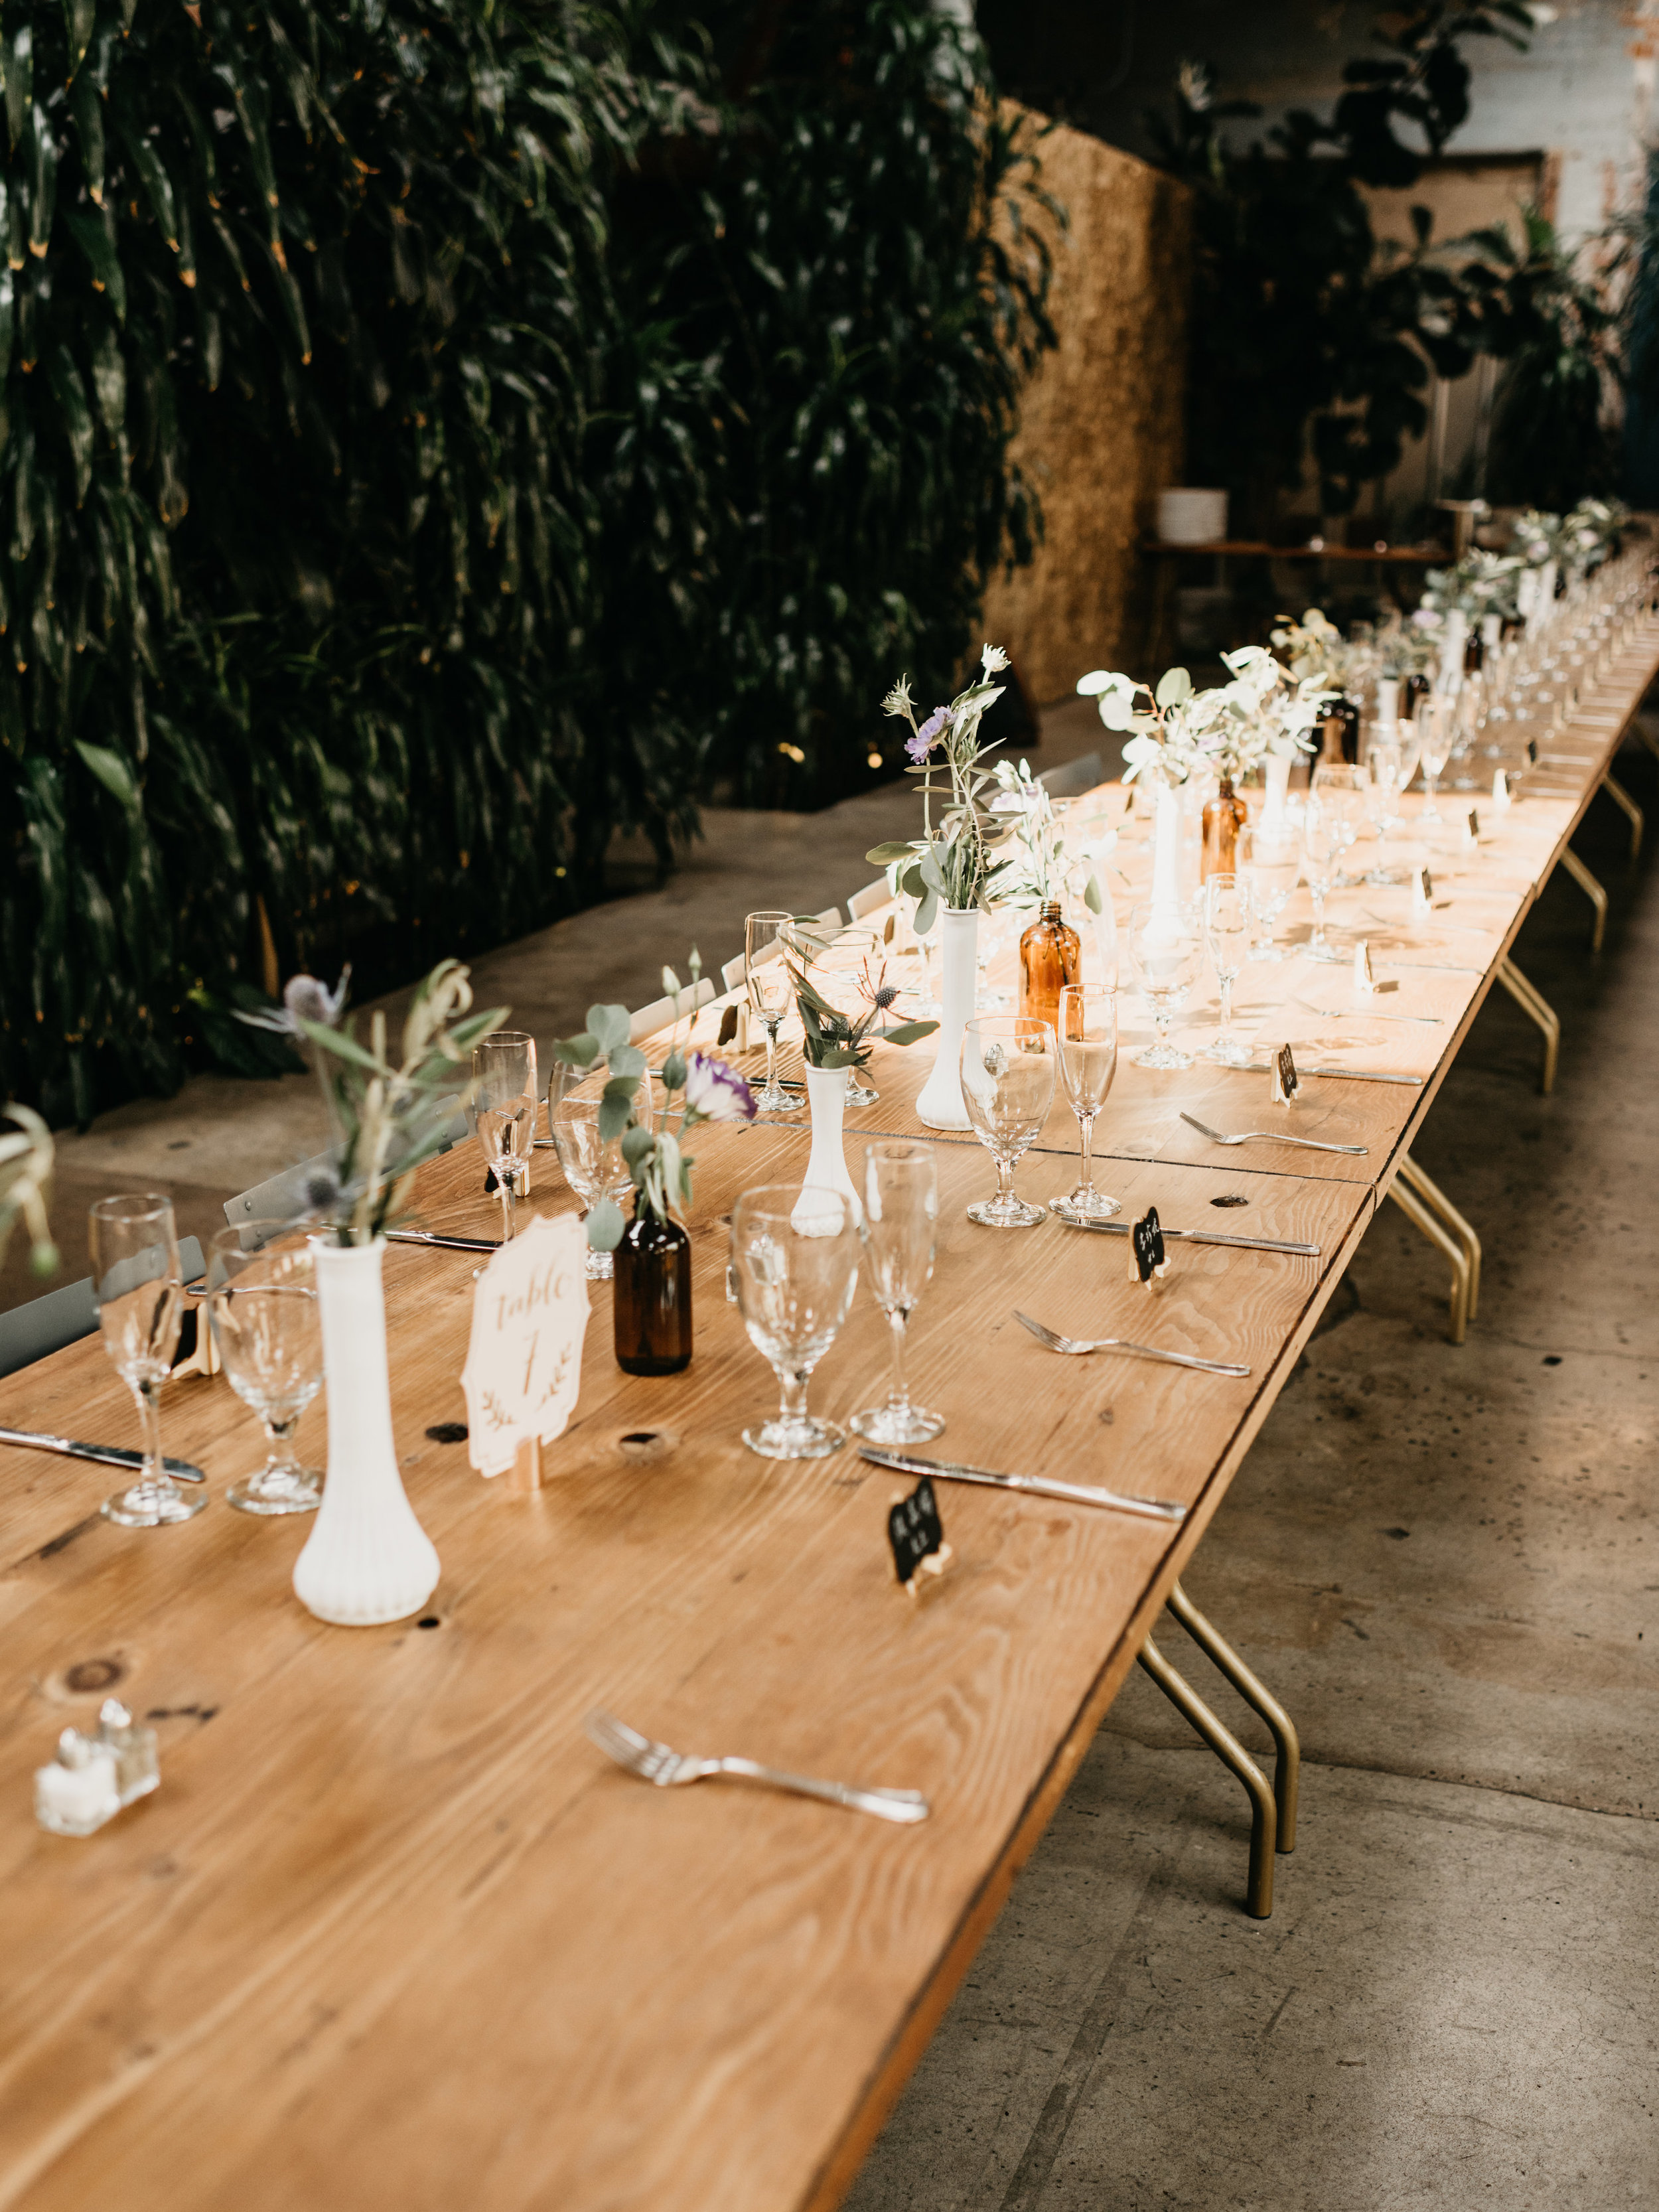 Millwick-wedding-planner43.jpg